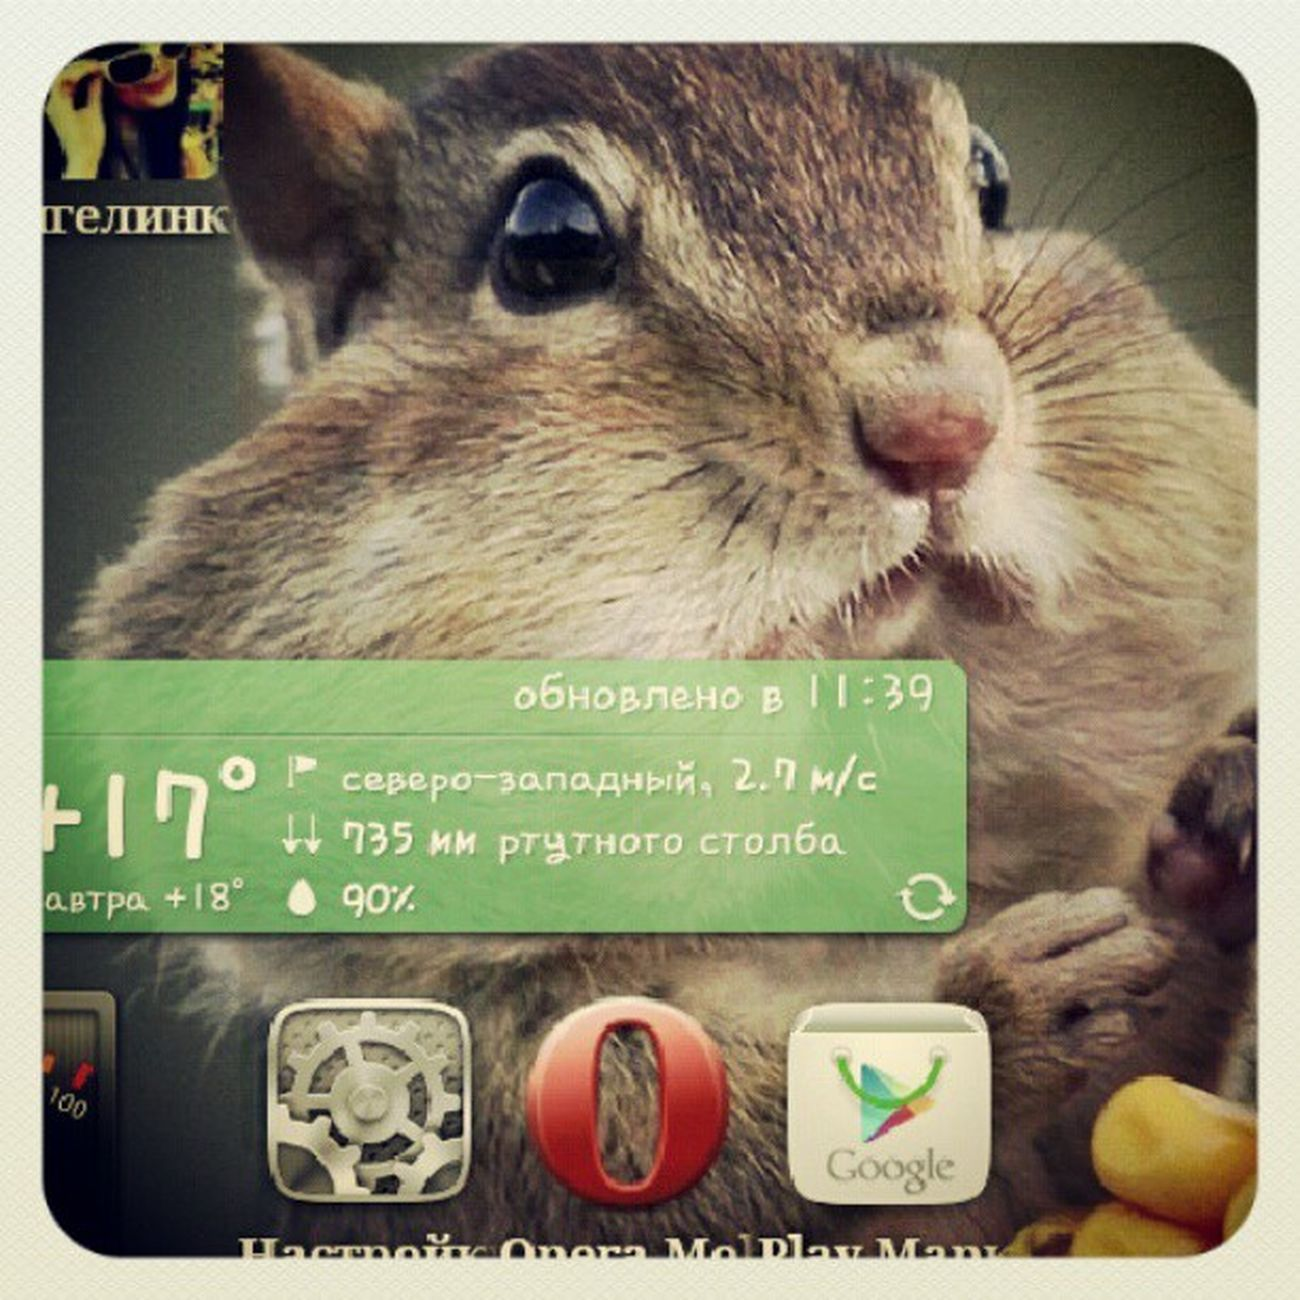 животные Android андройд хомяк new новое